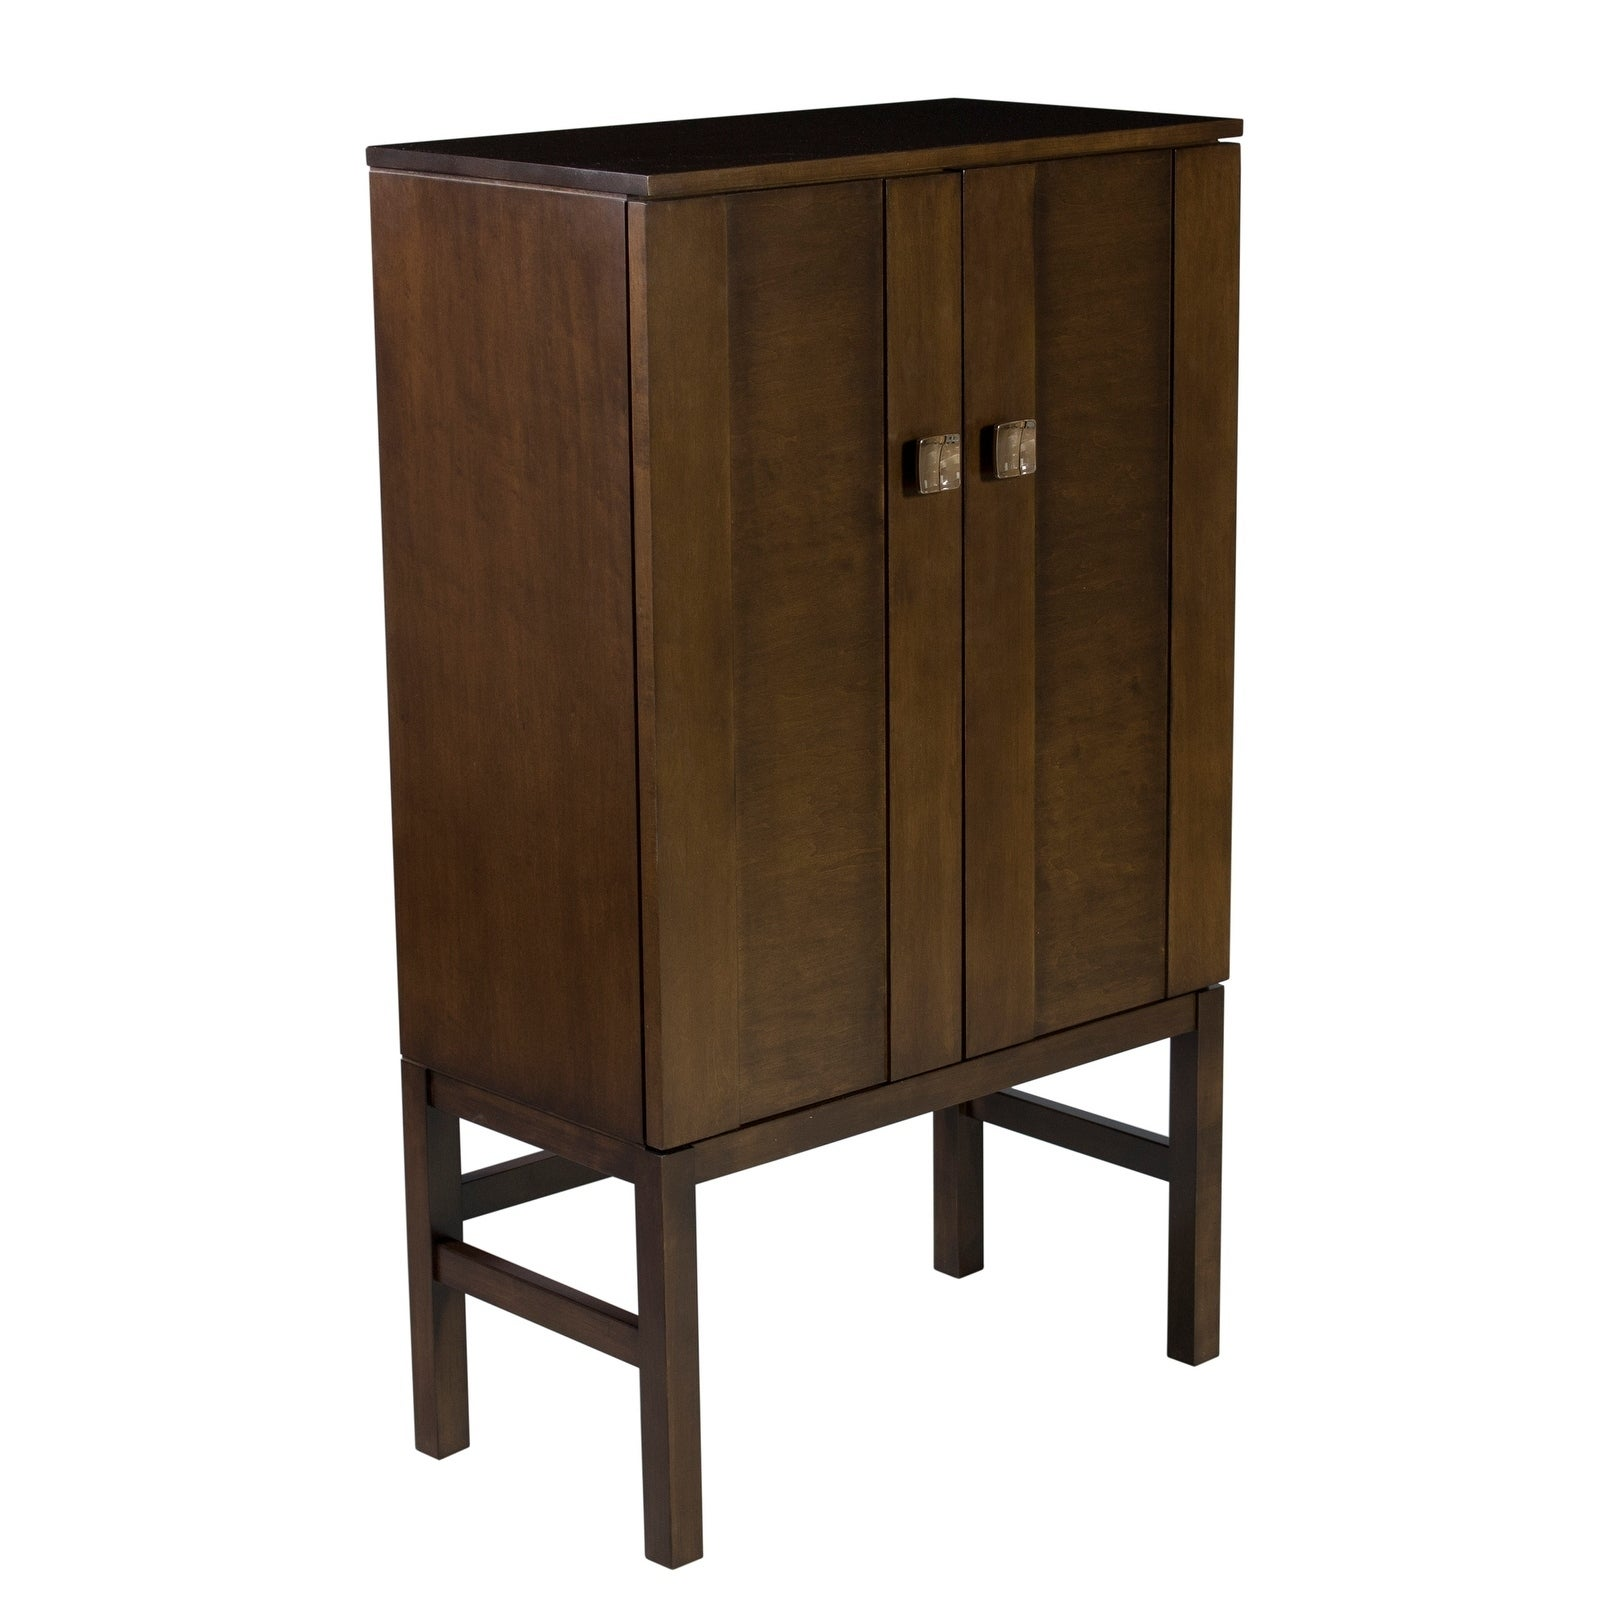 Saloom Furniture Cabinets And Storage